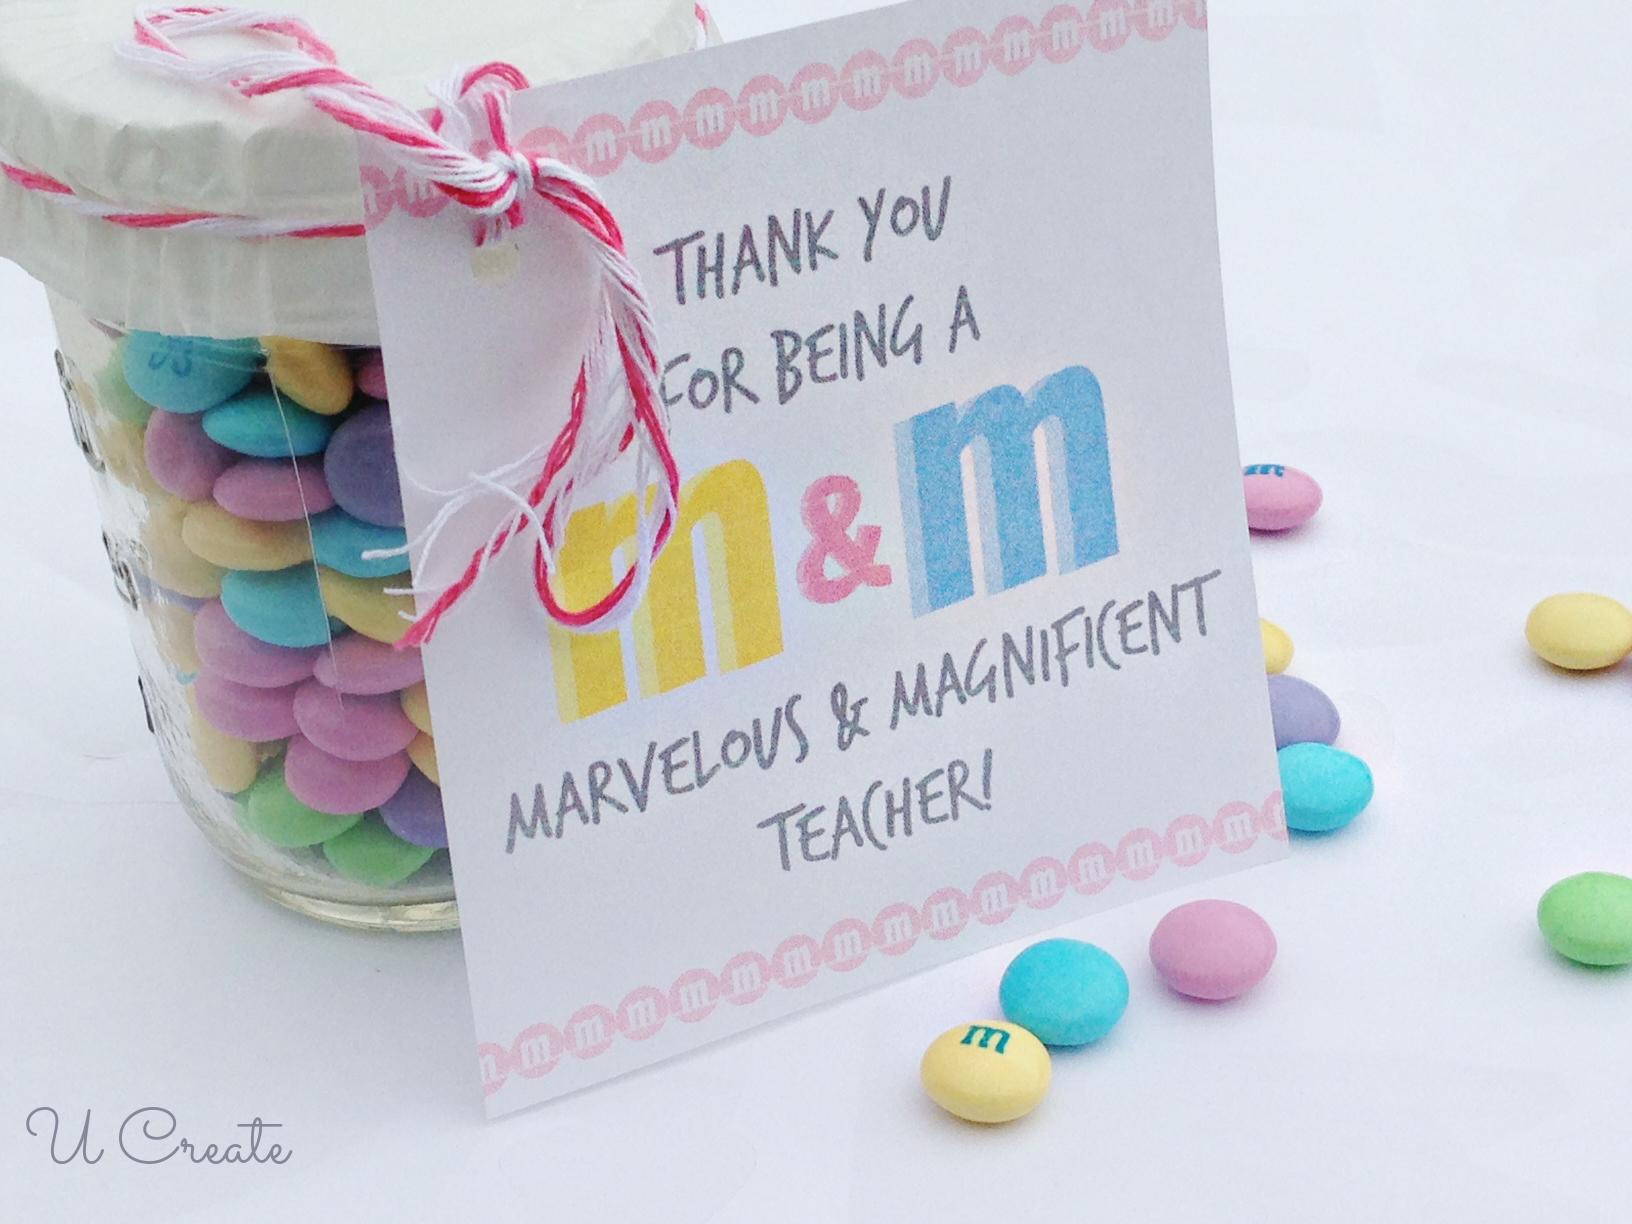 M & M Teacher Appreciation Quotes